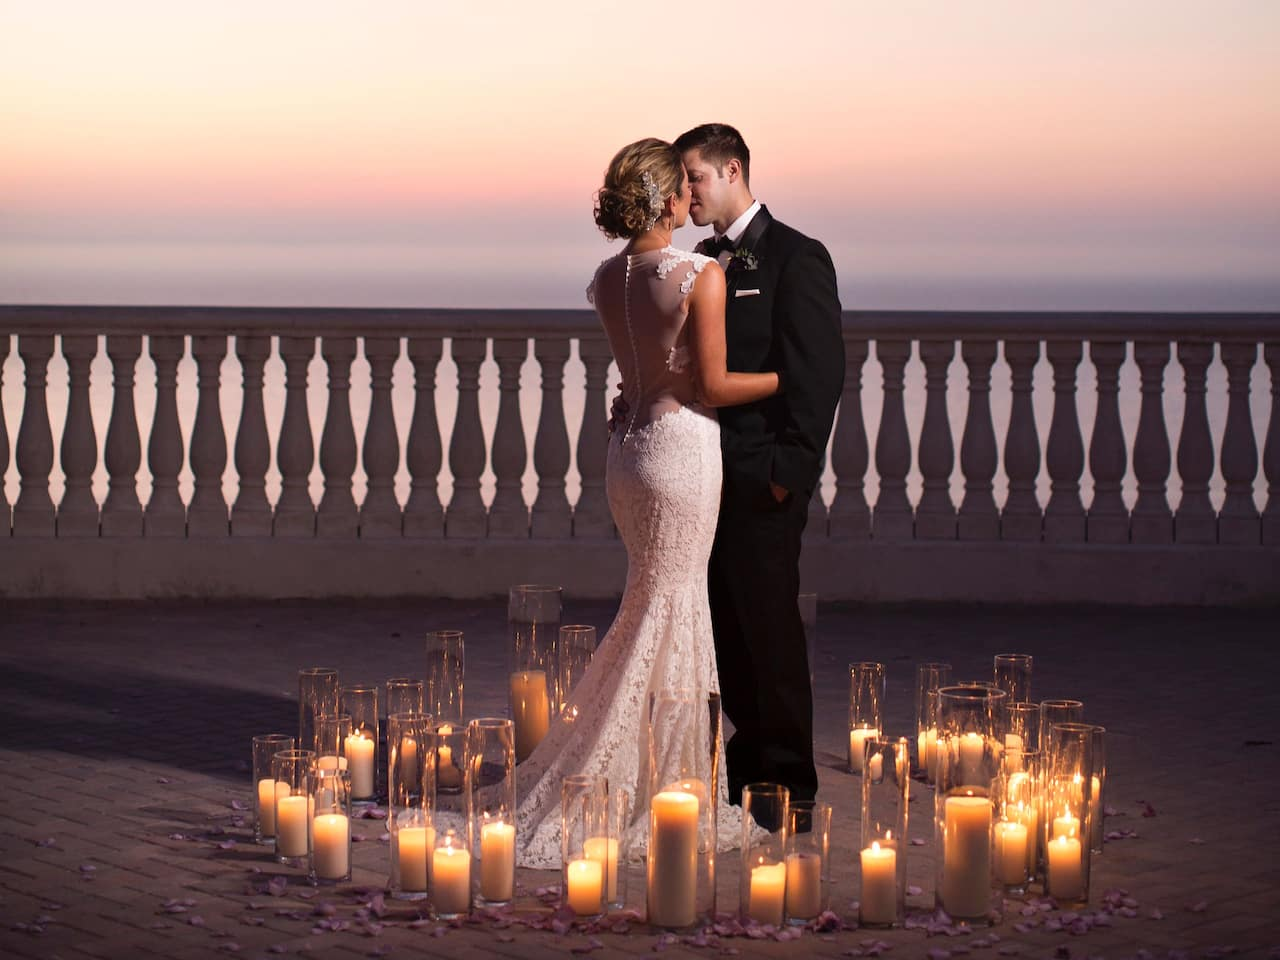 Beach wedding venue in Clearwater Beach